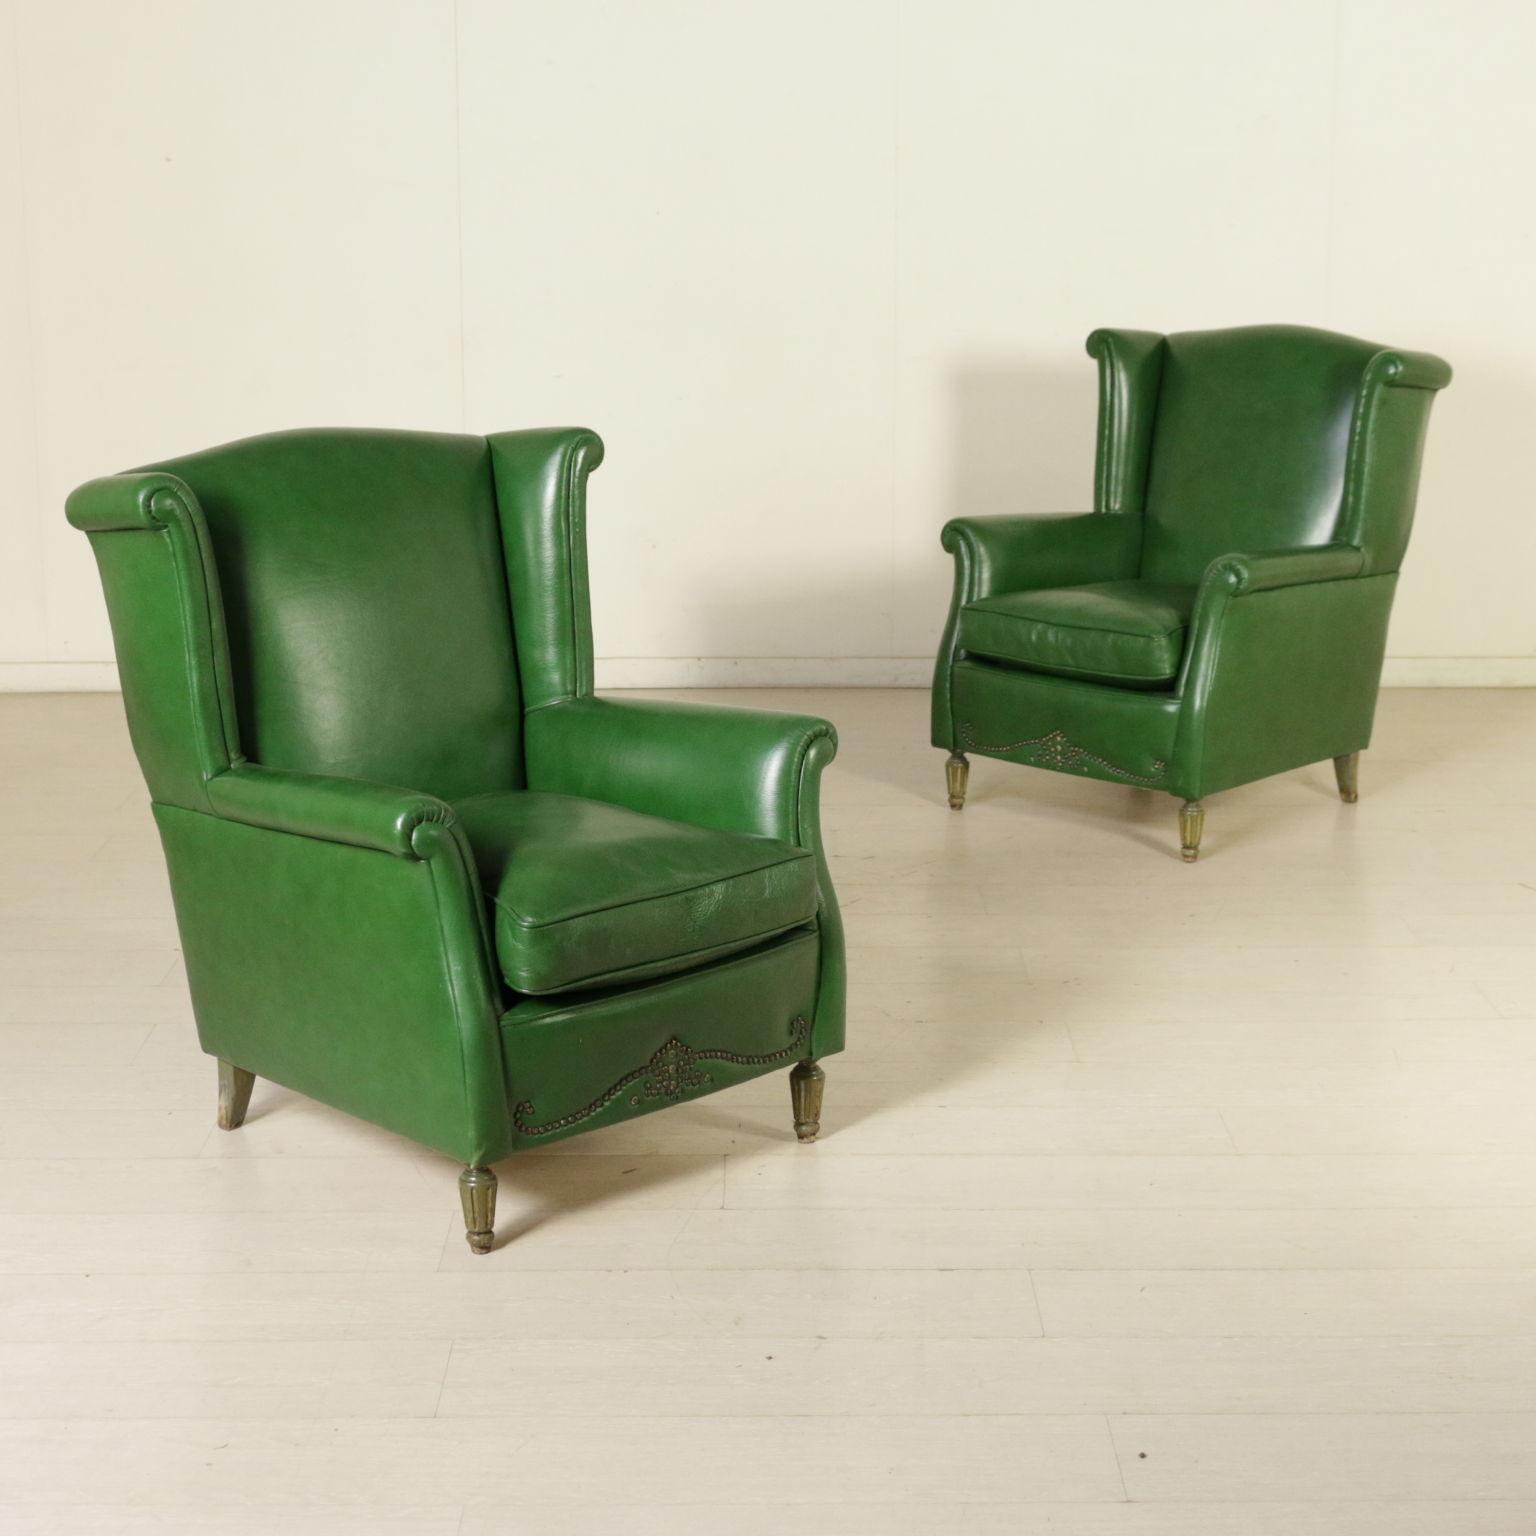 Sillones de los a os 50 sillones dise o moderno - Sillones de diseno italiano ...